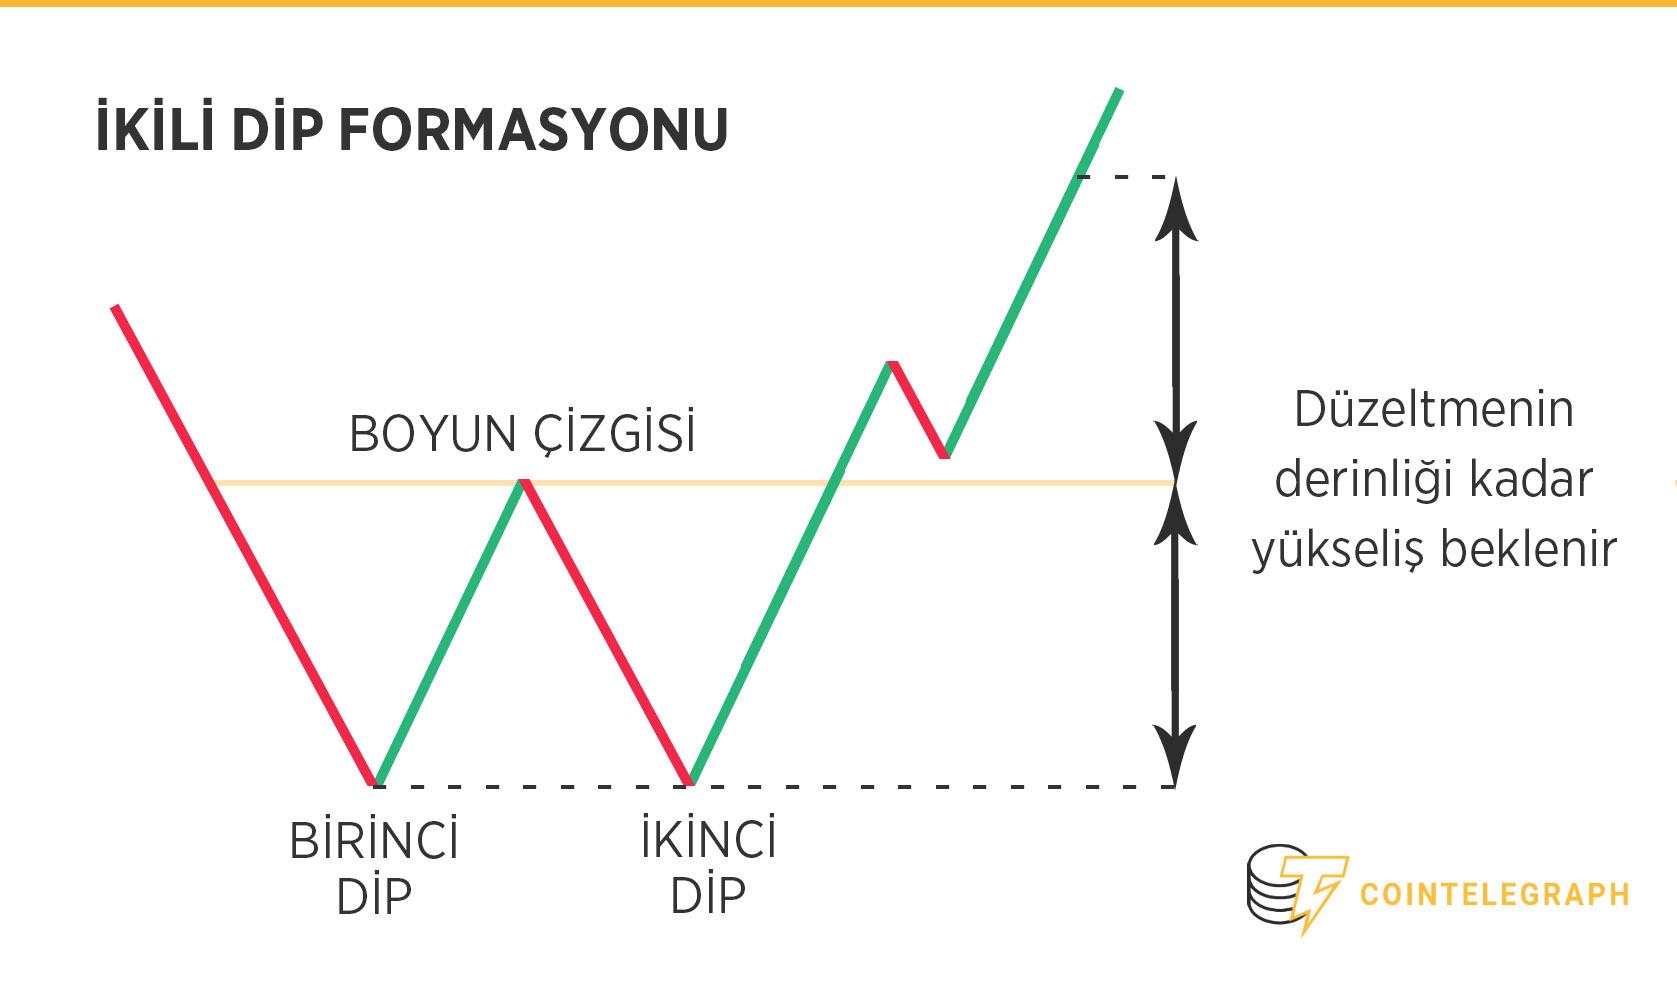 ikili dip formasyonu - çift dip modeli